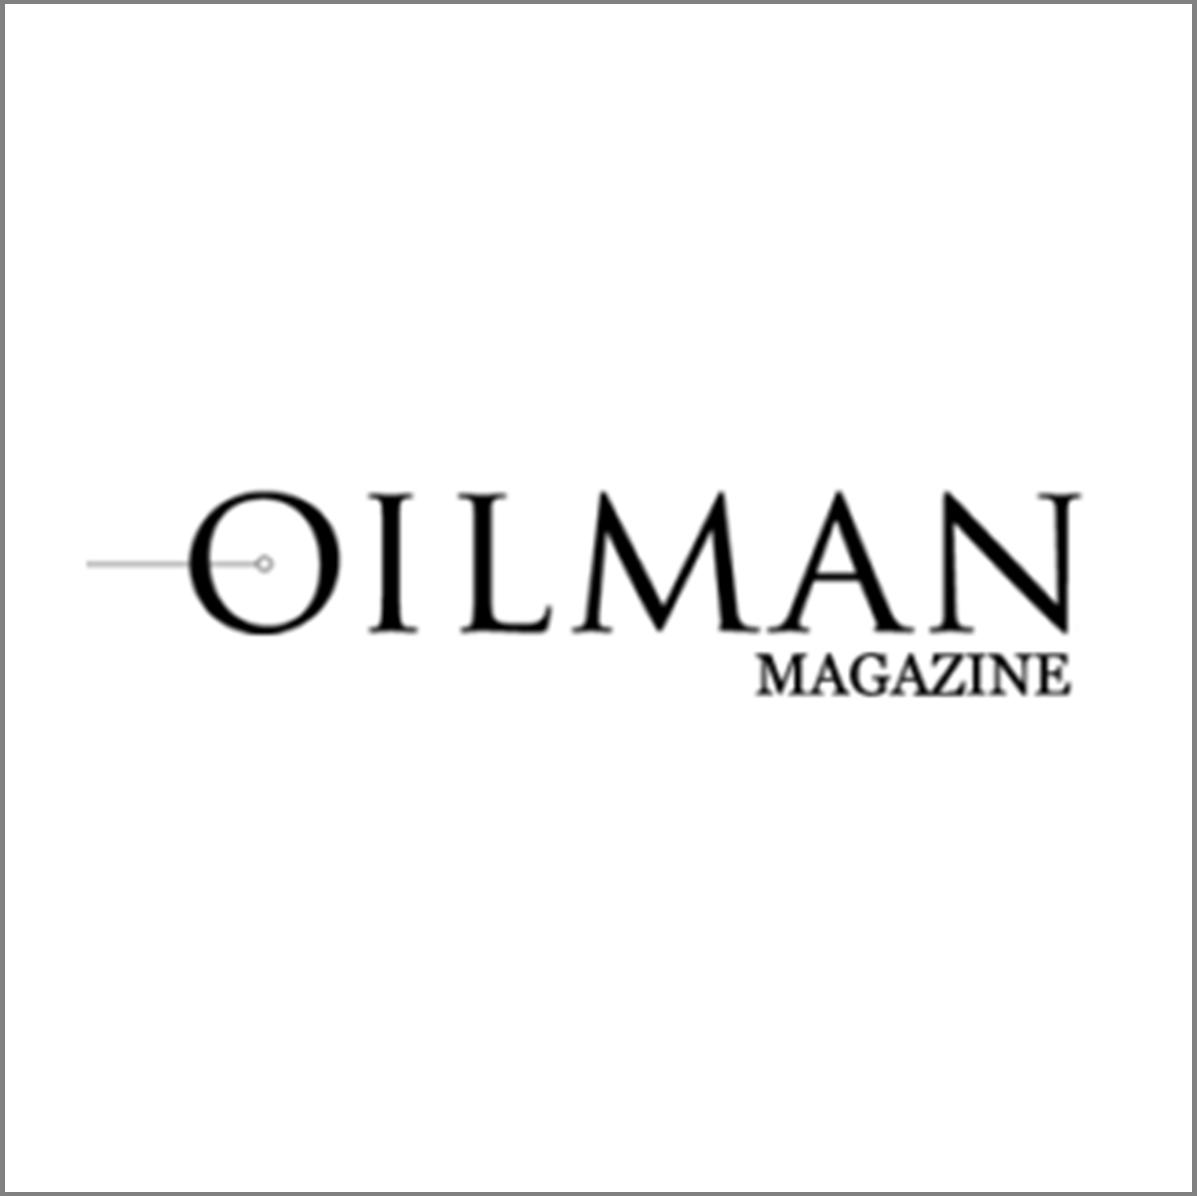 Oilman slider